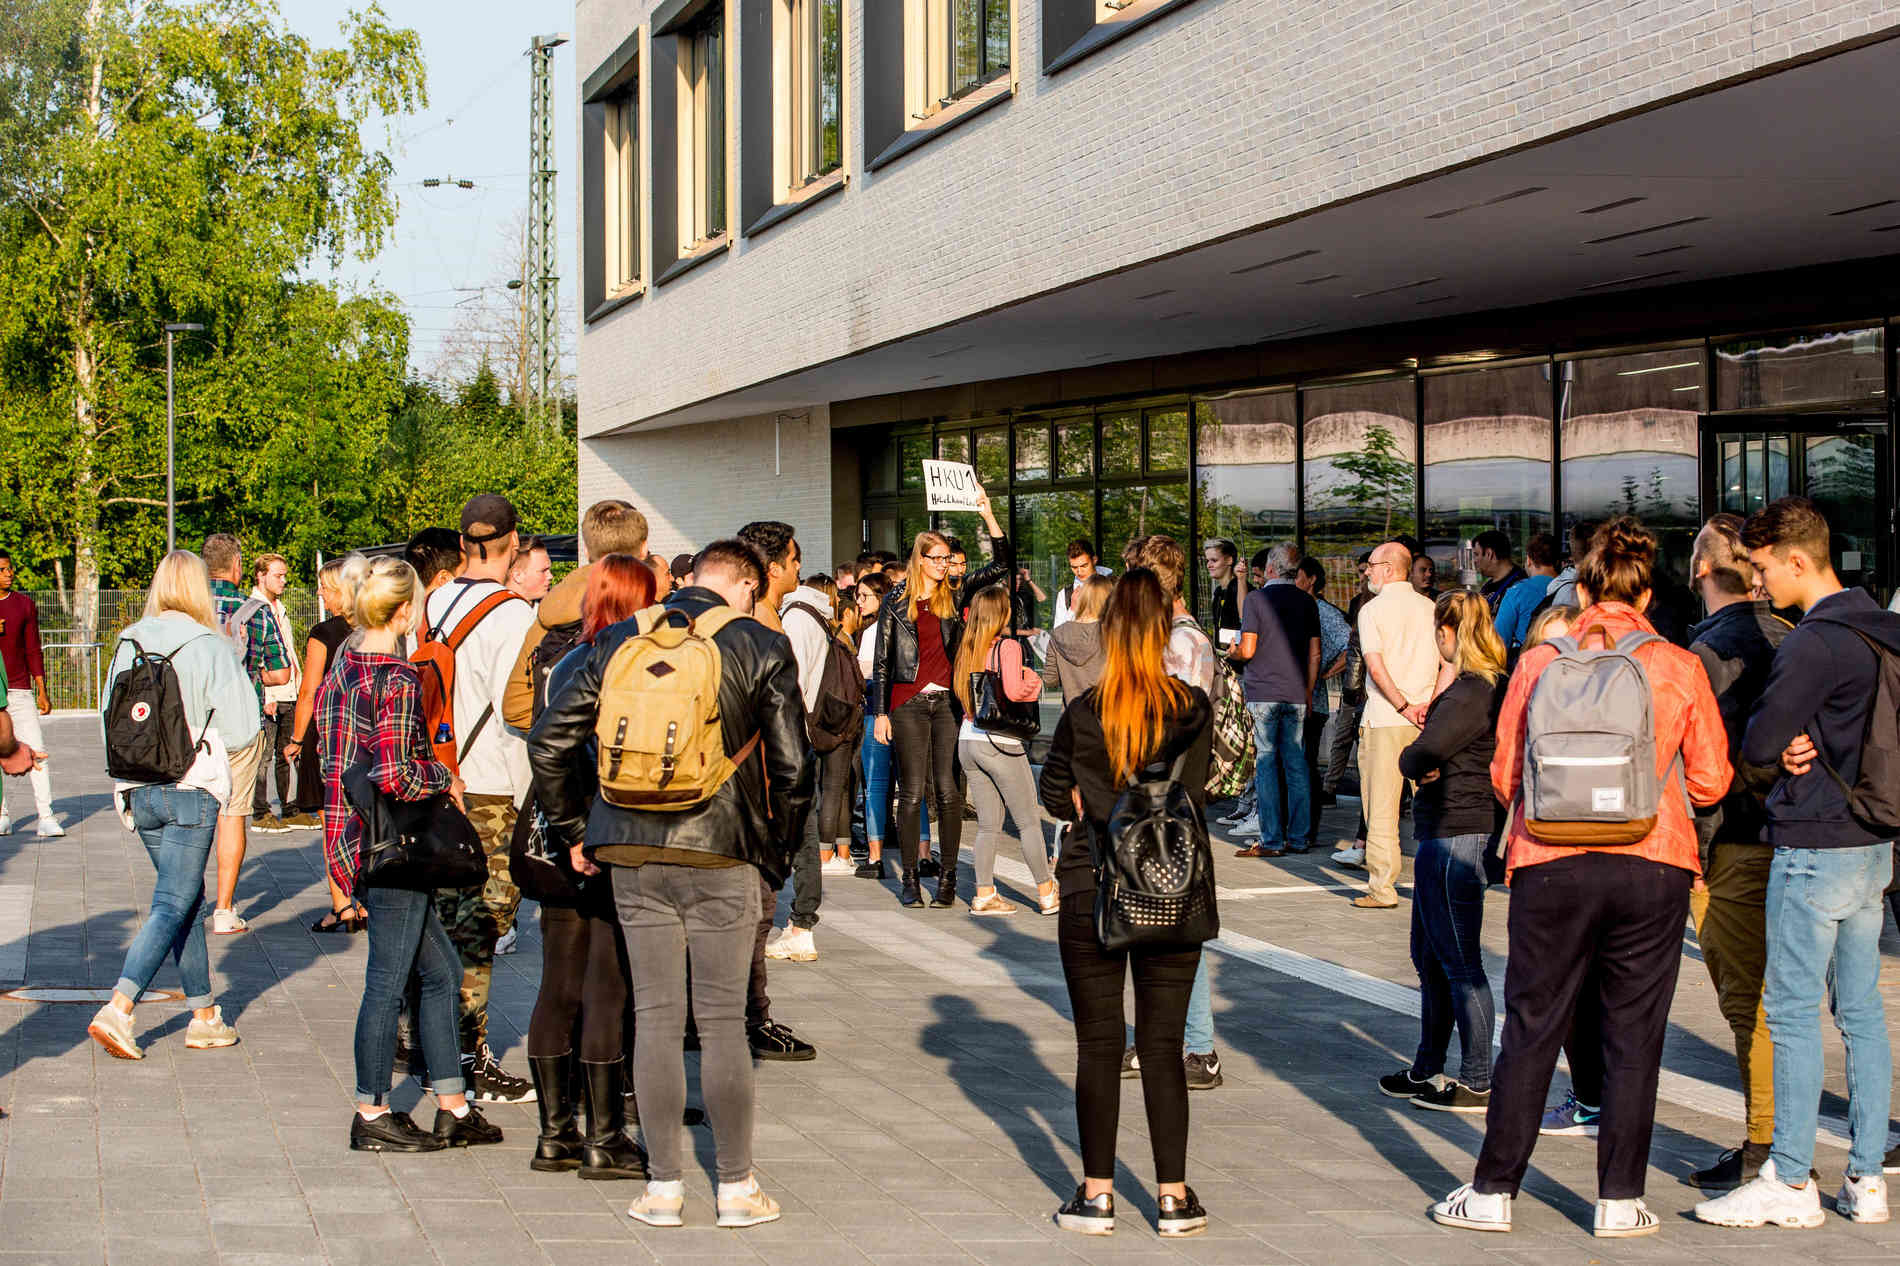 Düsseldorf-Benrath: Erster Schultag Am Neuen Albrecht-Dürer bestimmt für Albrecht Dürer Schule Düsseldorf